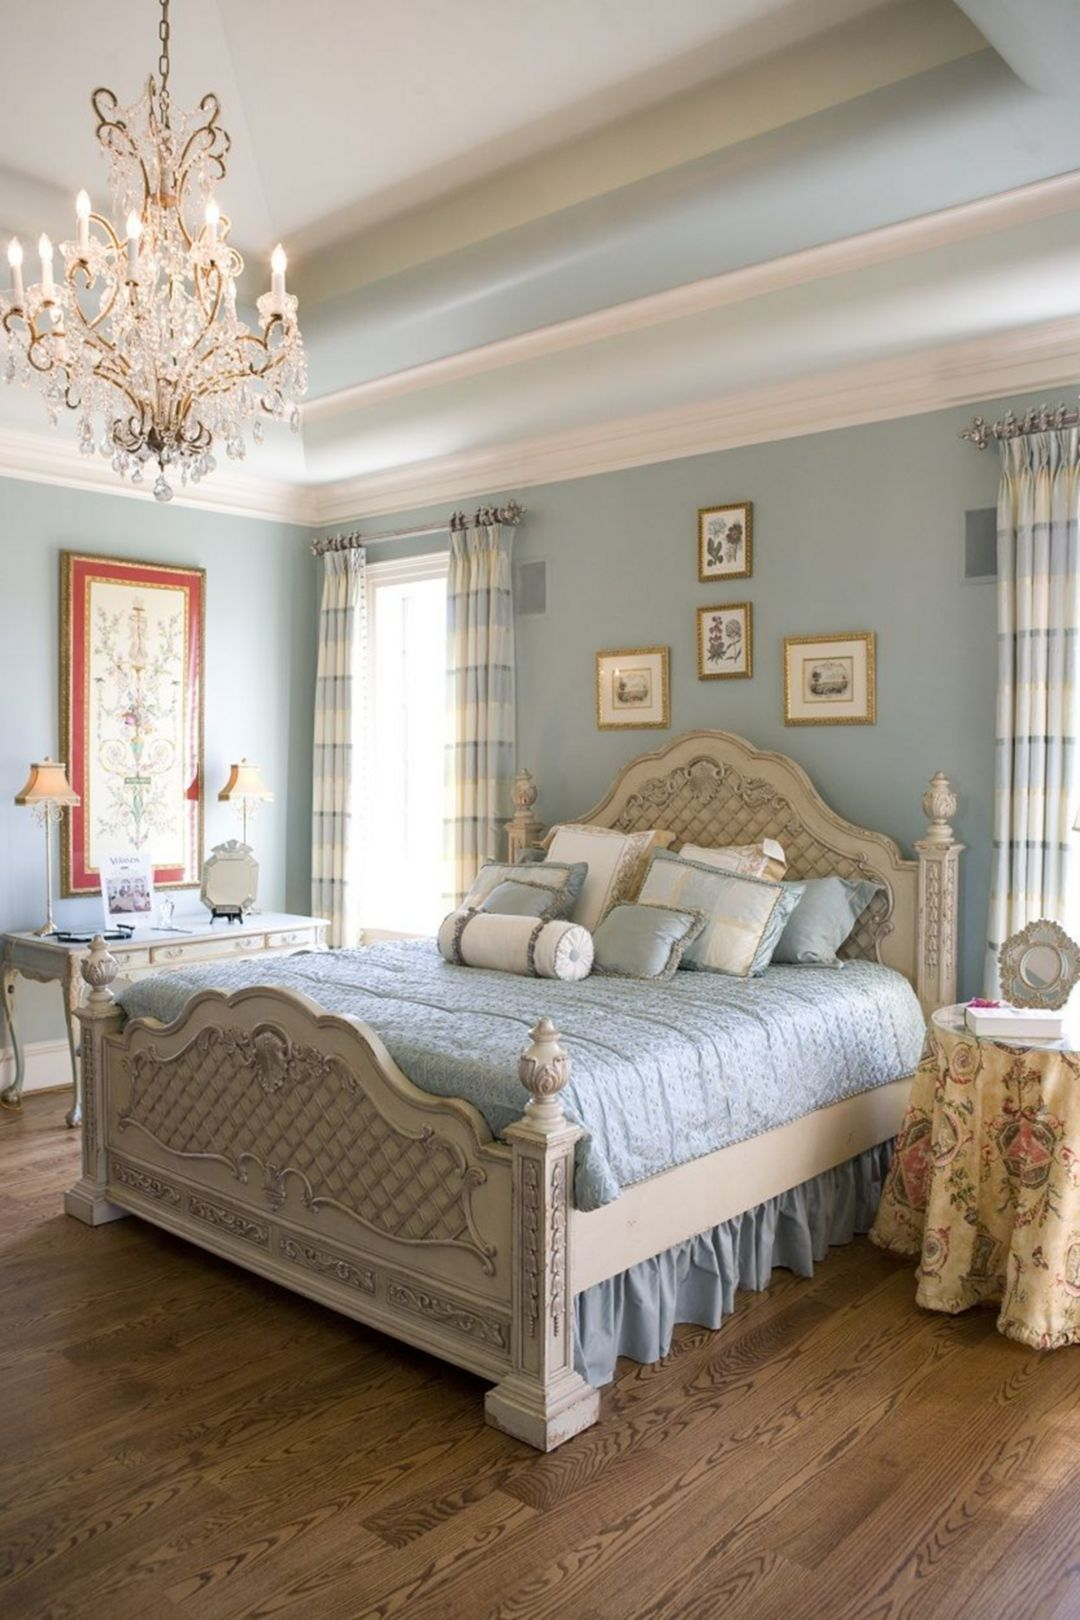 Best Pin By Emily Zoe On Bedroom Design Decor Ideas In 2019 400 x 300